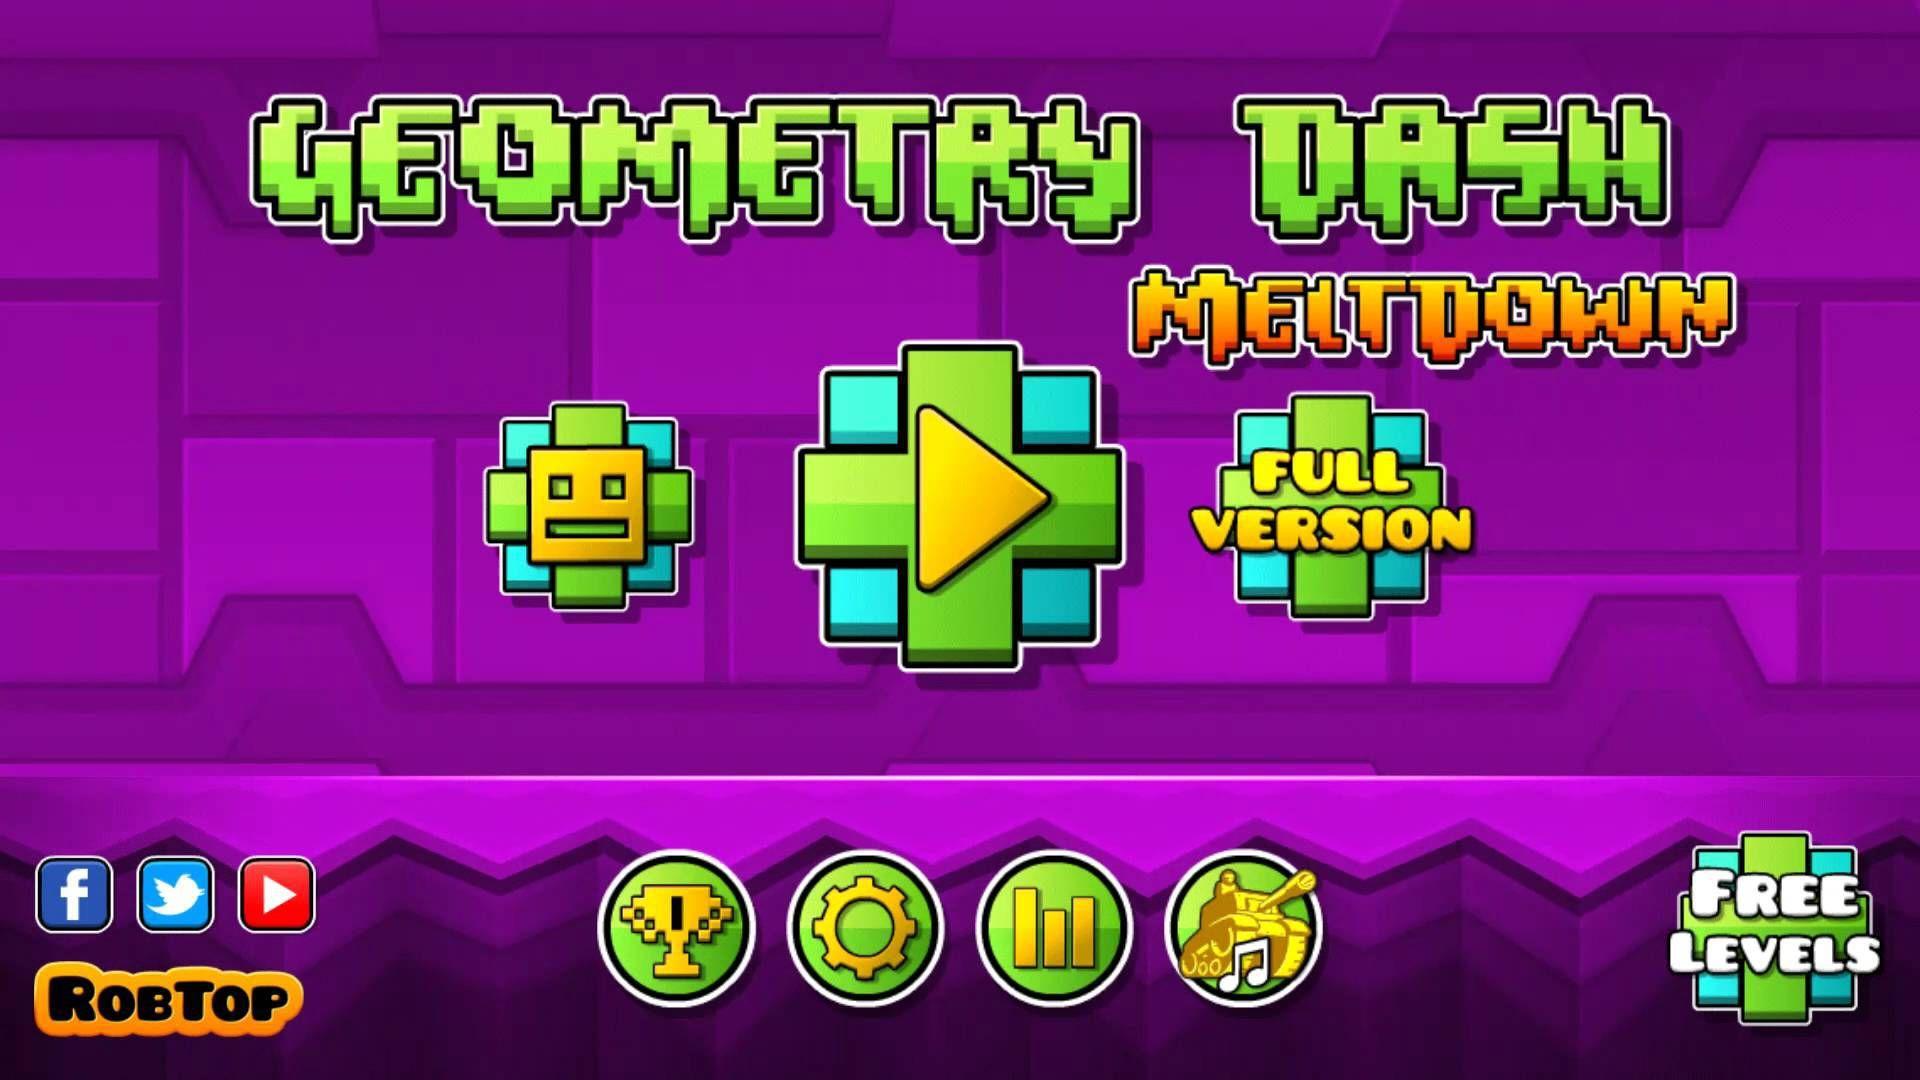 Geometry dash meltdown for pc free download.